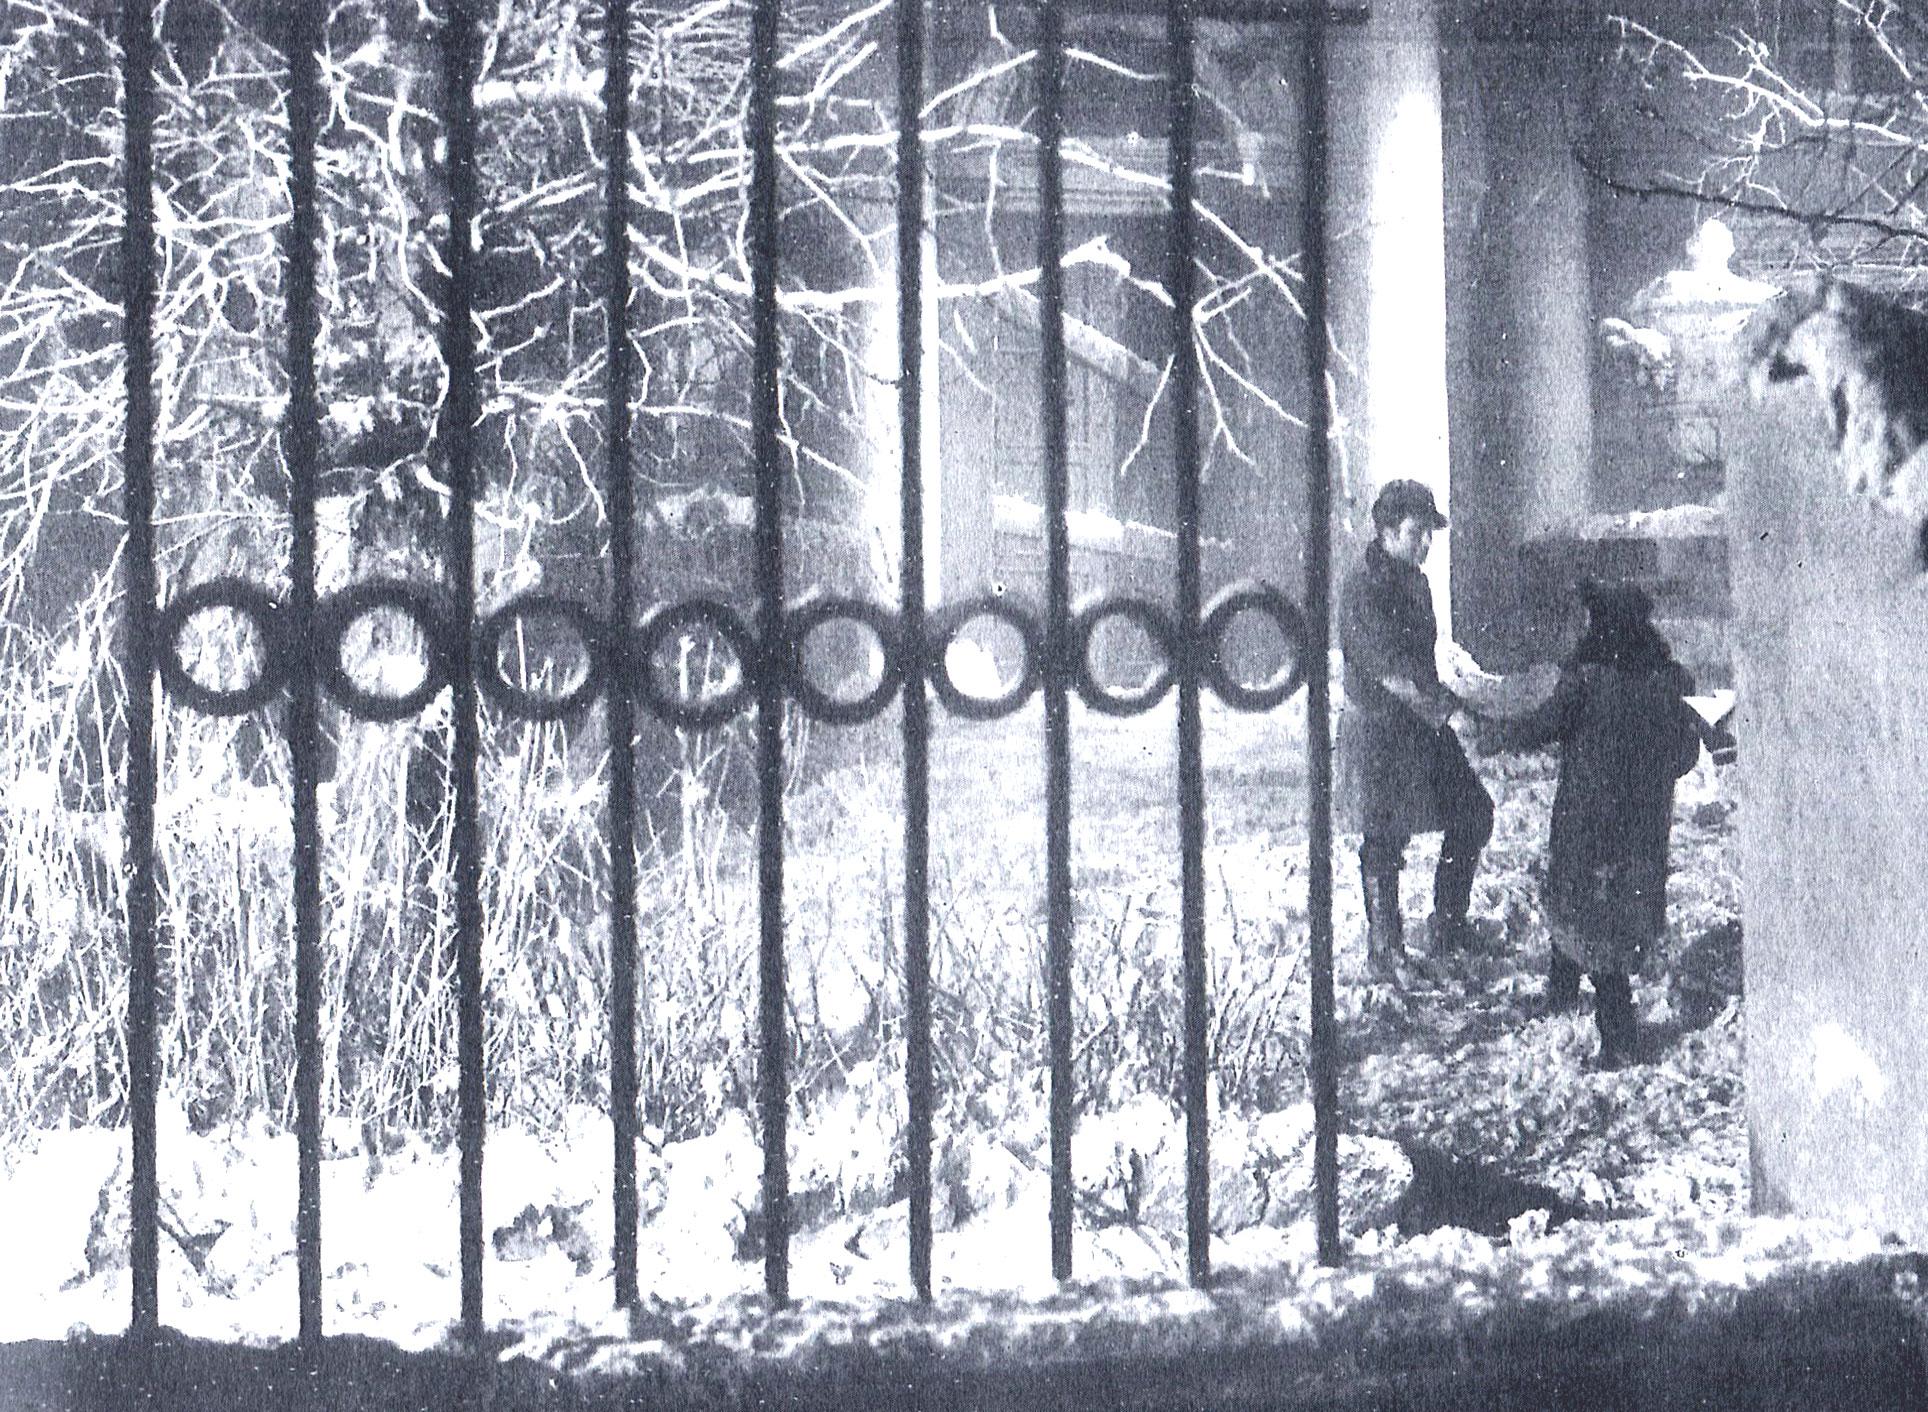 File:noivivi foto sc giardino.jpg   wikipedia